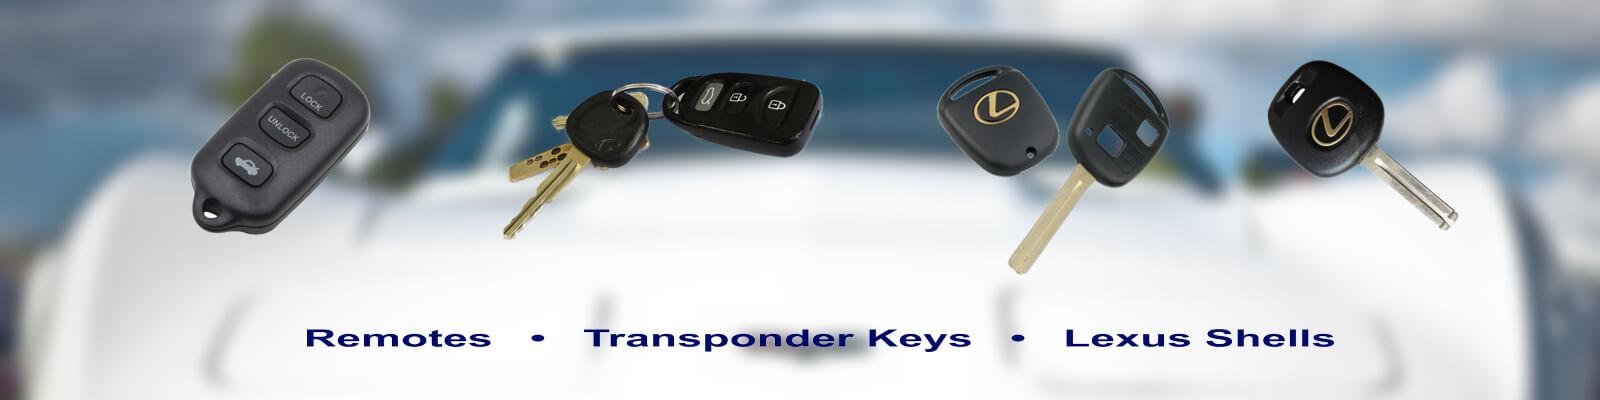 Car Remotes - Keys For Cars Berkeley California (866) 269-5625